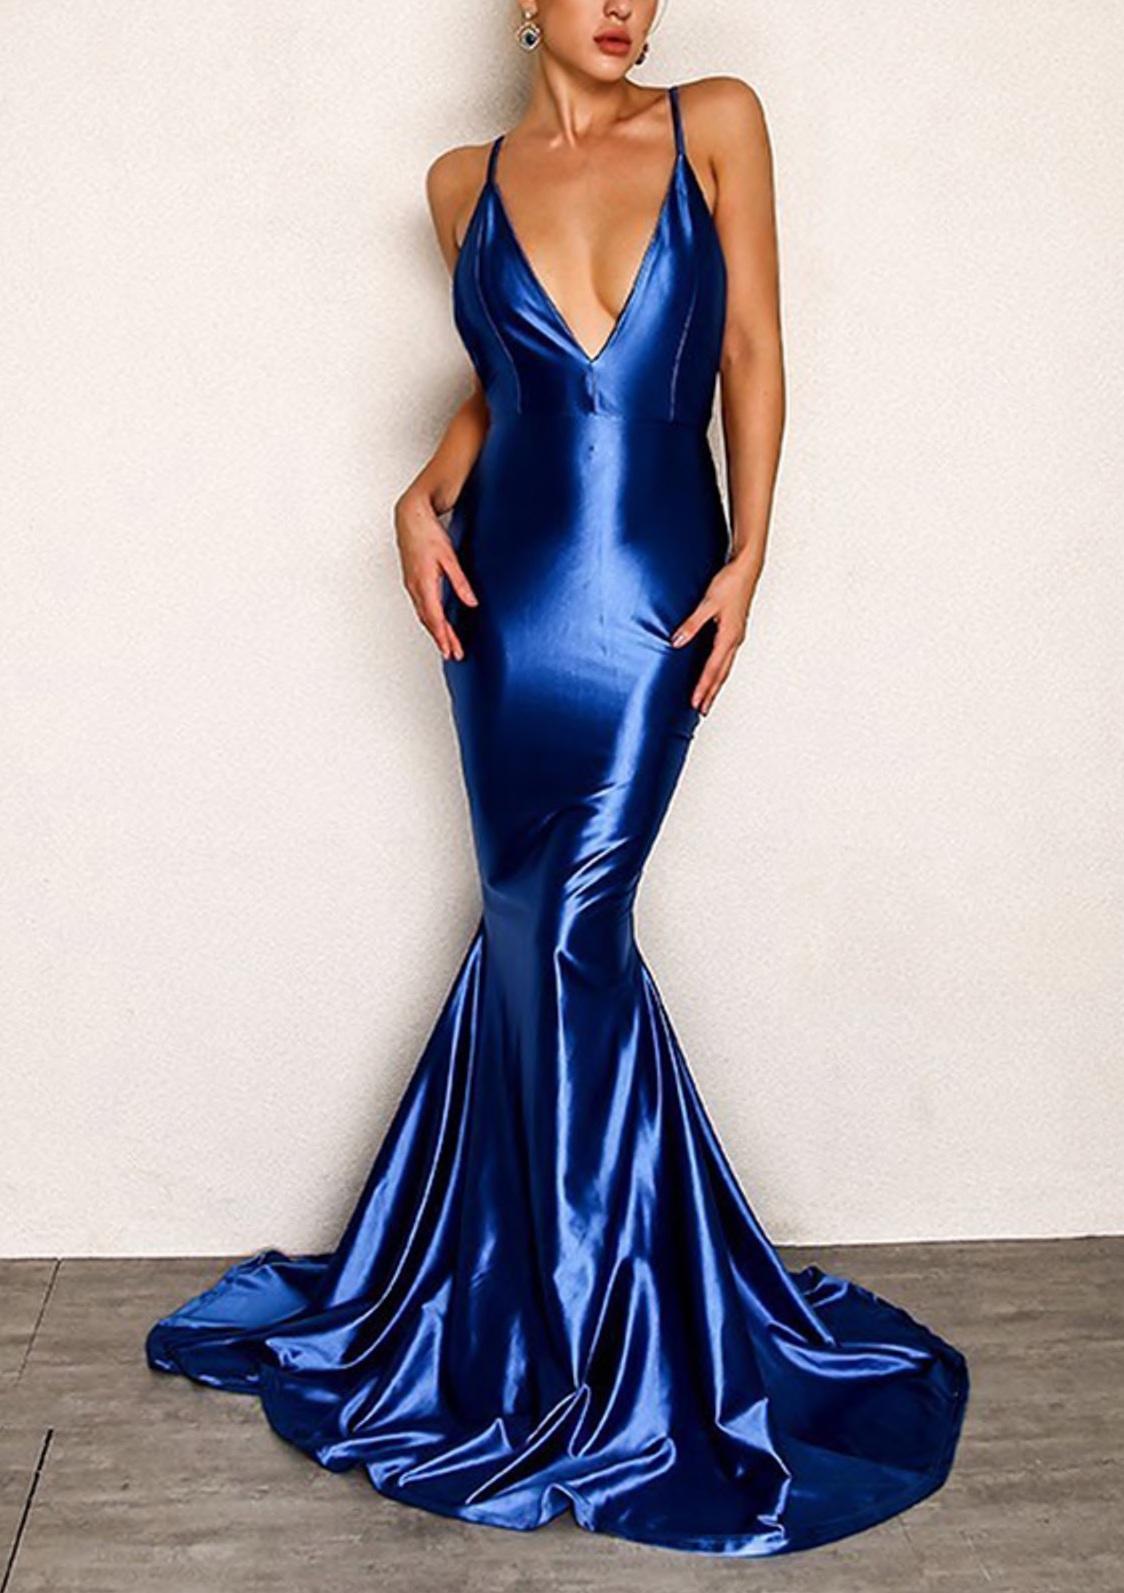 dress girly girl girly wishlist blue blue dress mermaid prom dress mermaid prom dress prom prom gown prom beauty long prom dress